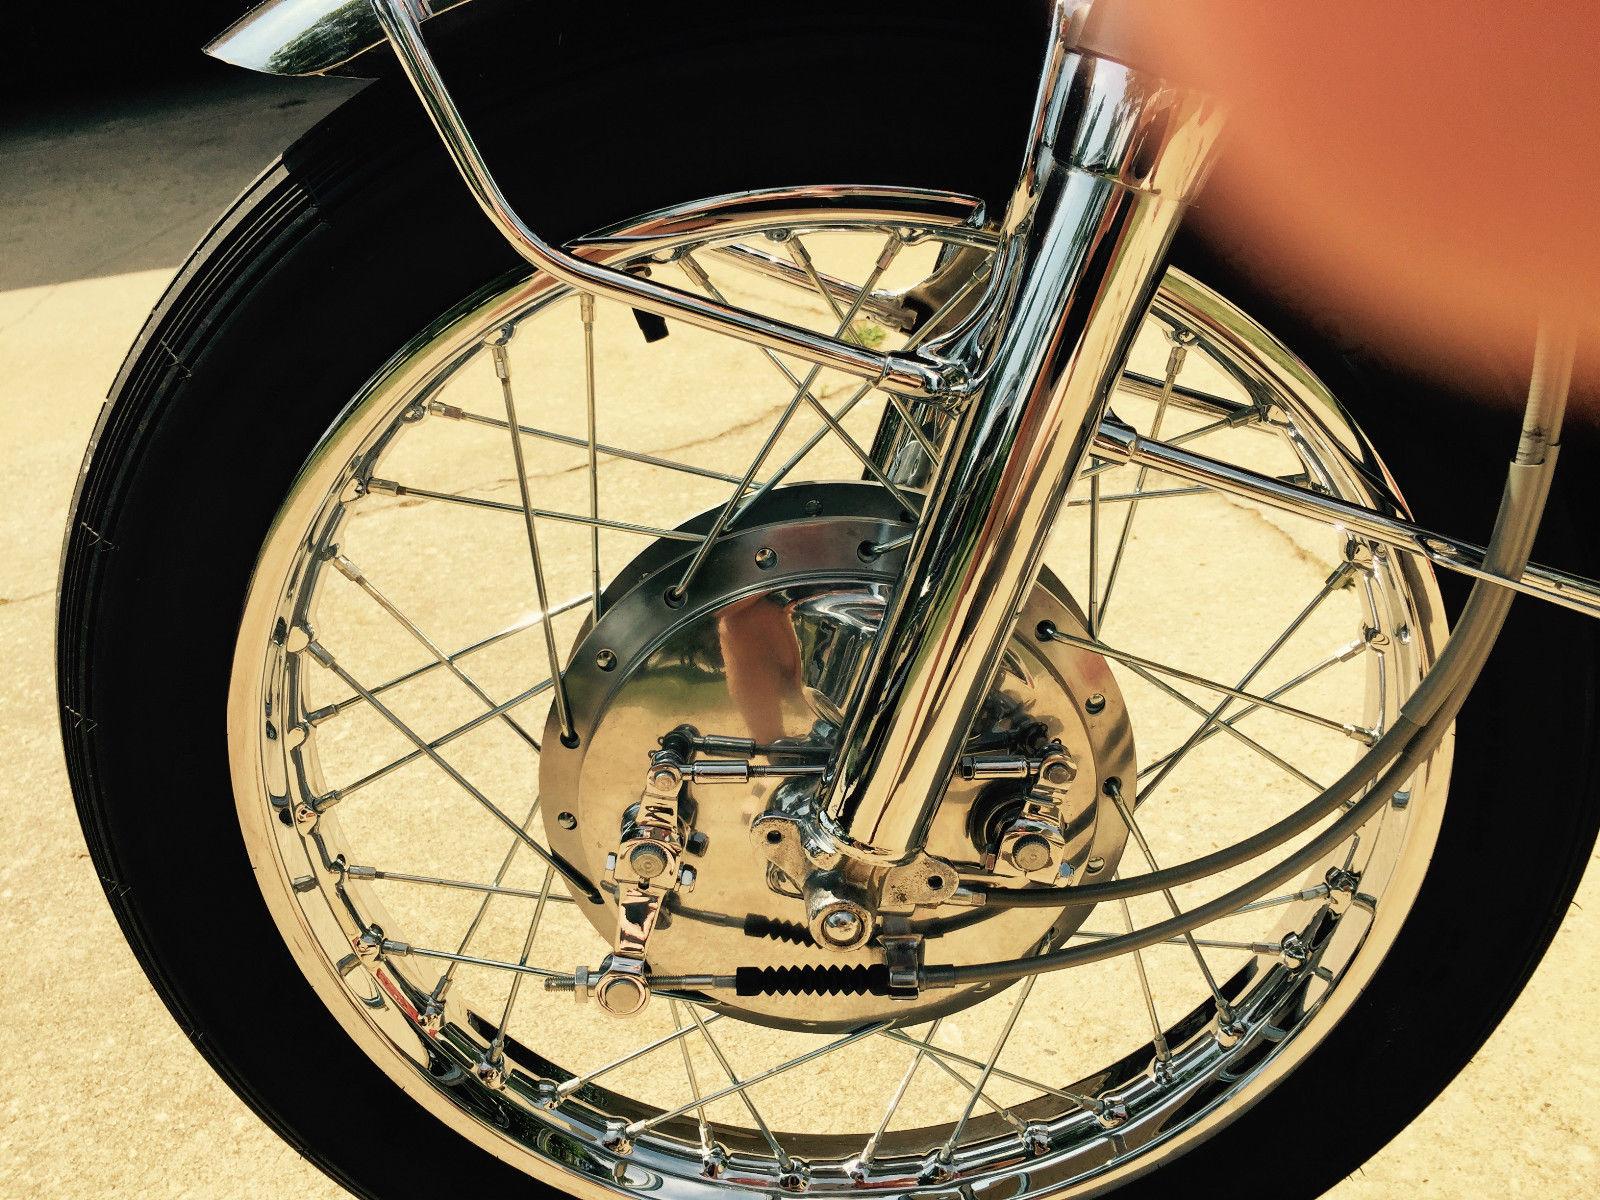 Suzuki T250 - 1972 - Front brake, Plate, Wheel, Spokes, Mudguard and Speedo Cable.